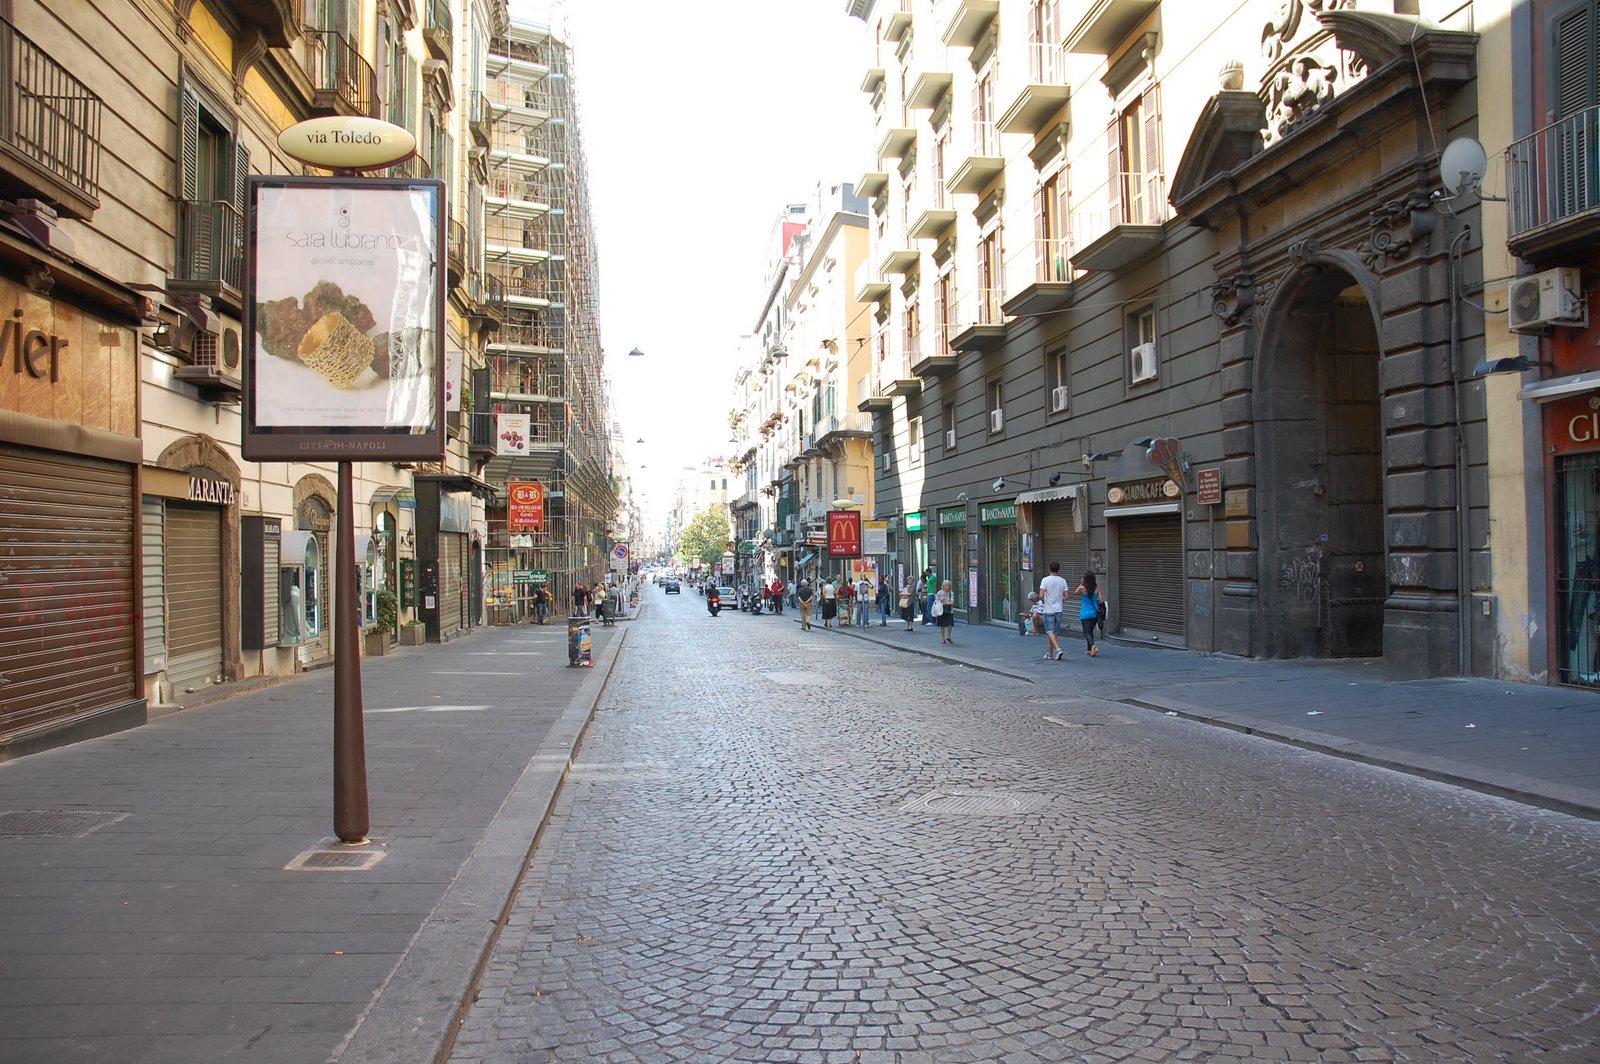 Vetrine fuorilegge, multati i negozi di via Toledo